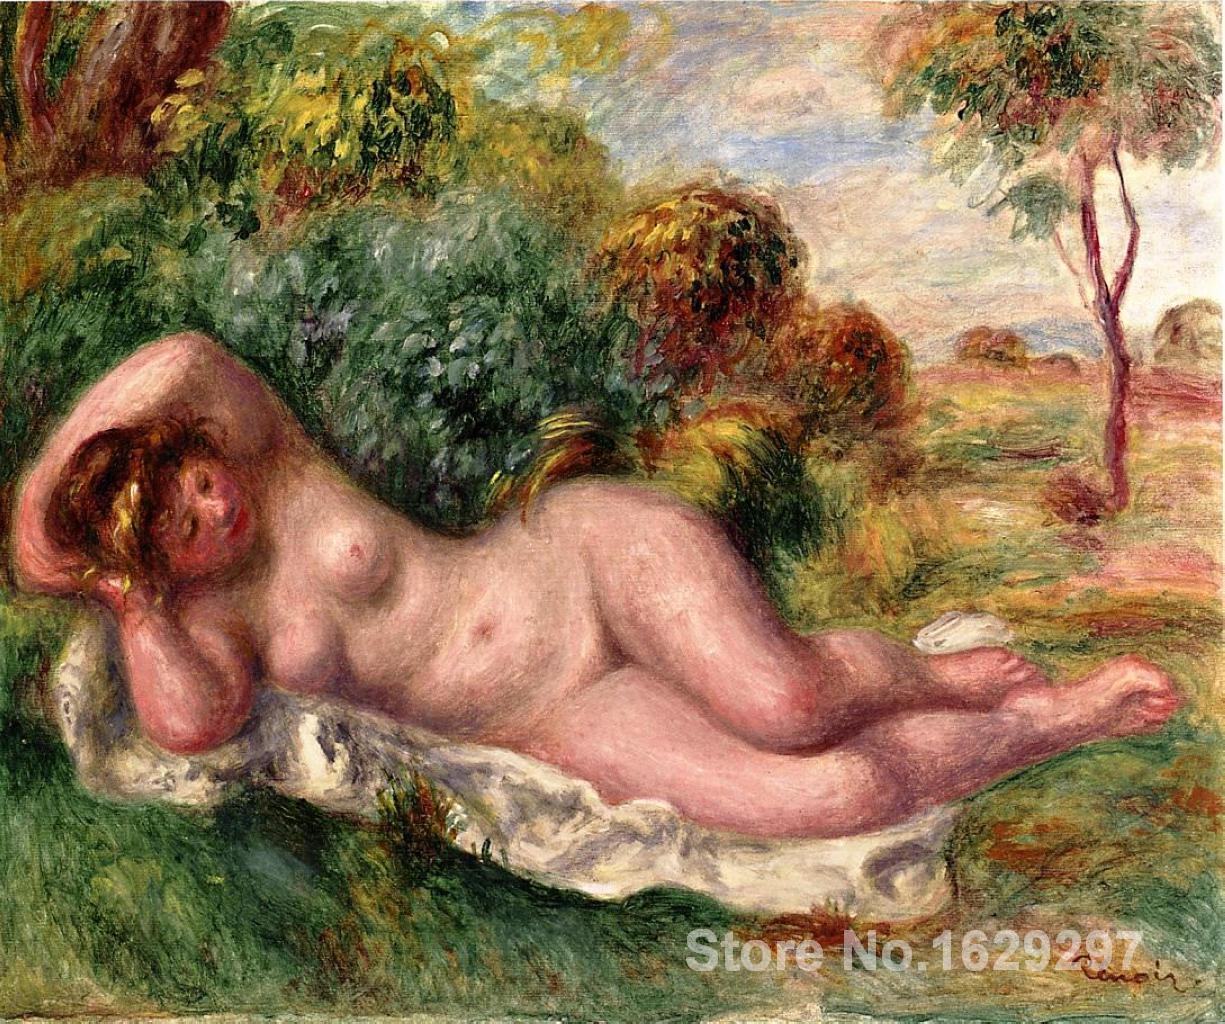 Nude istri, shemale anal masturbating